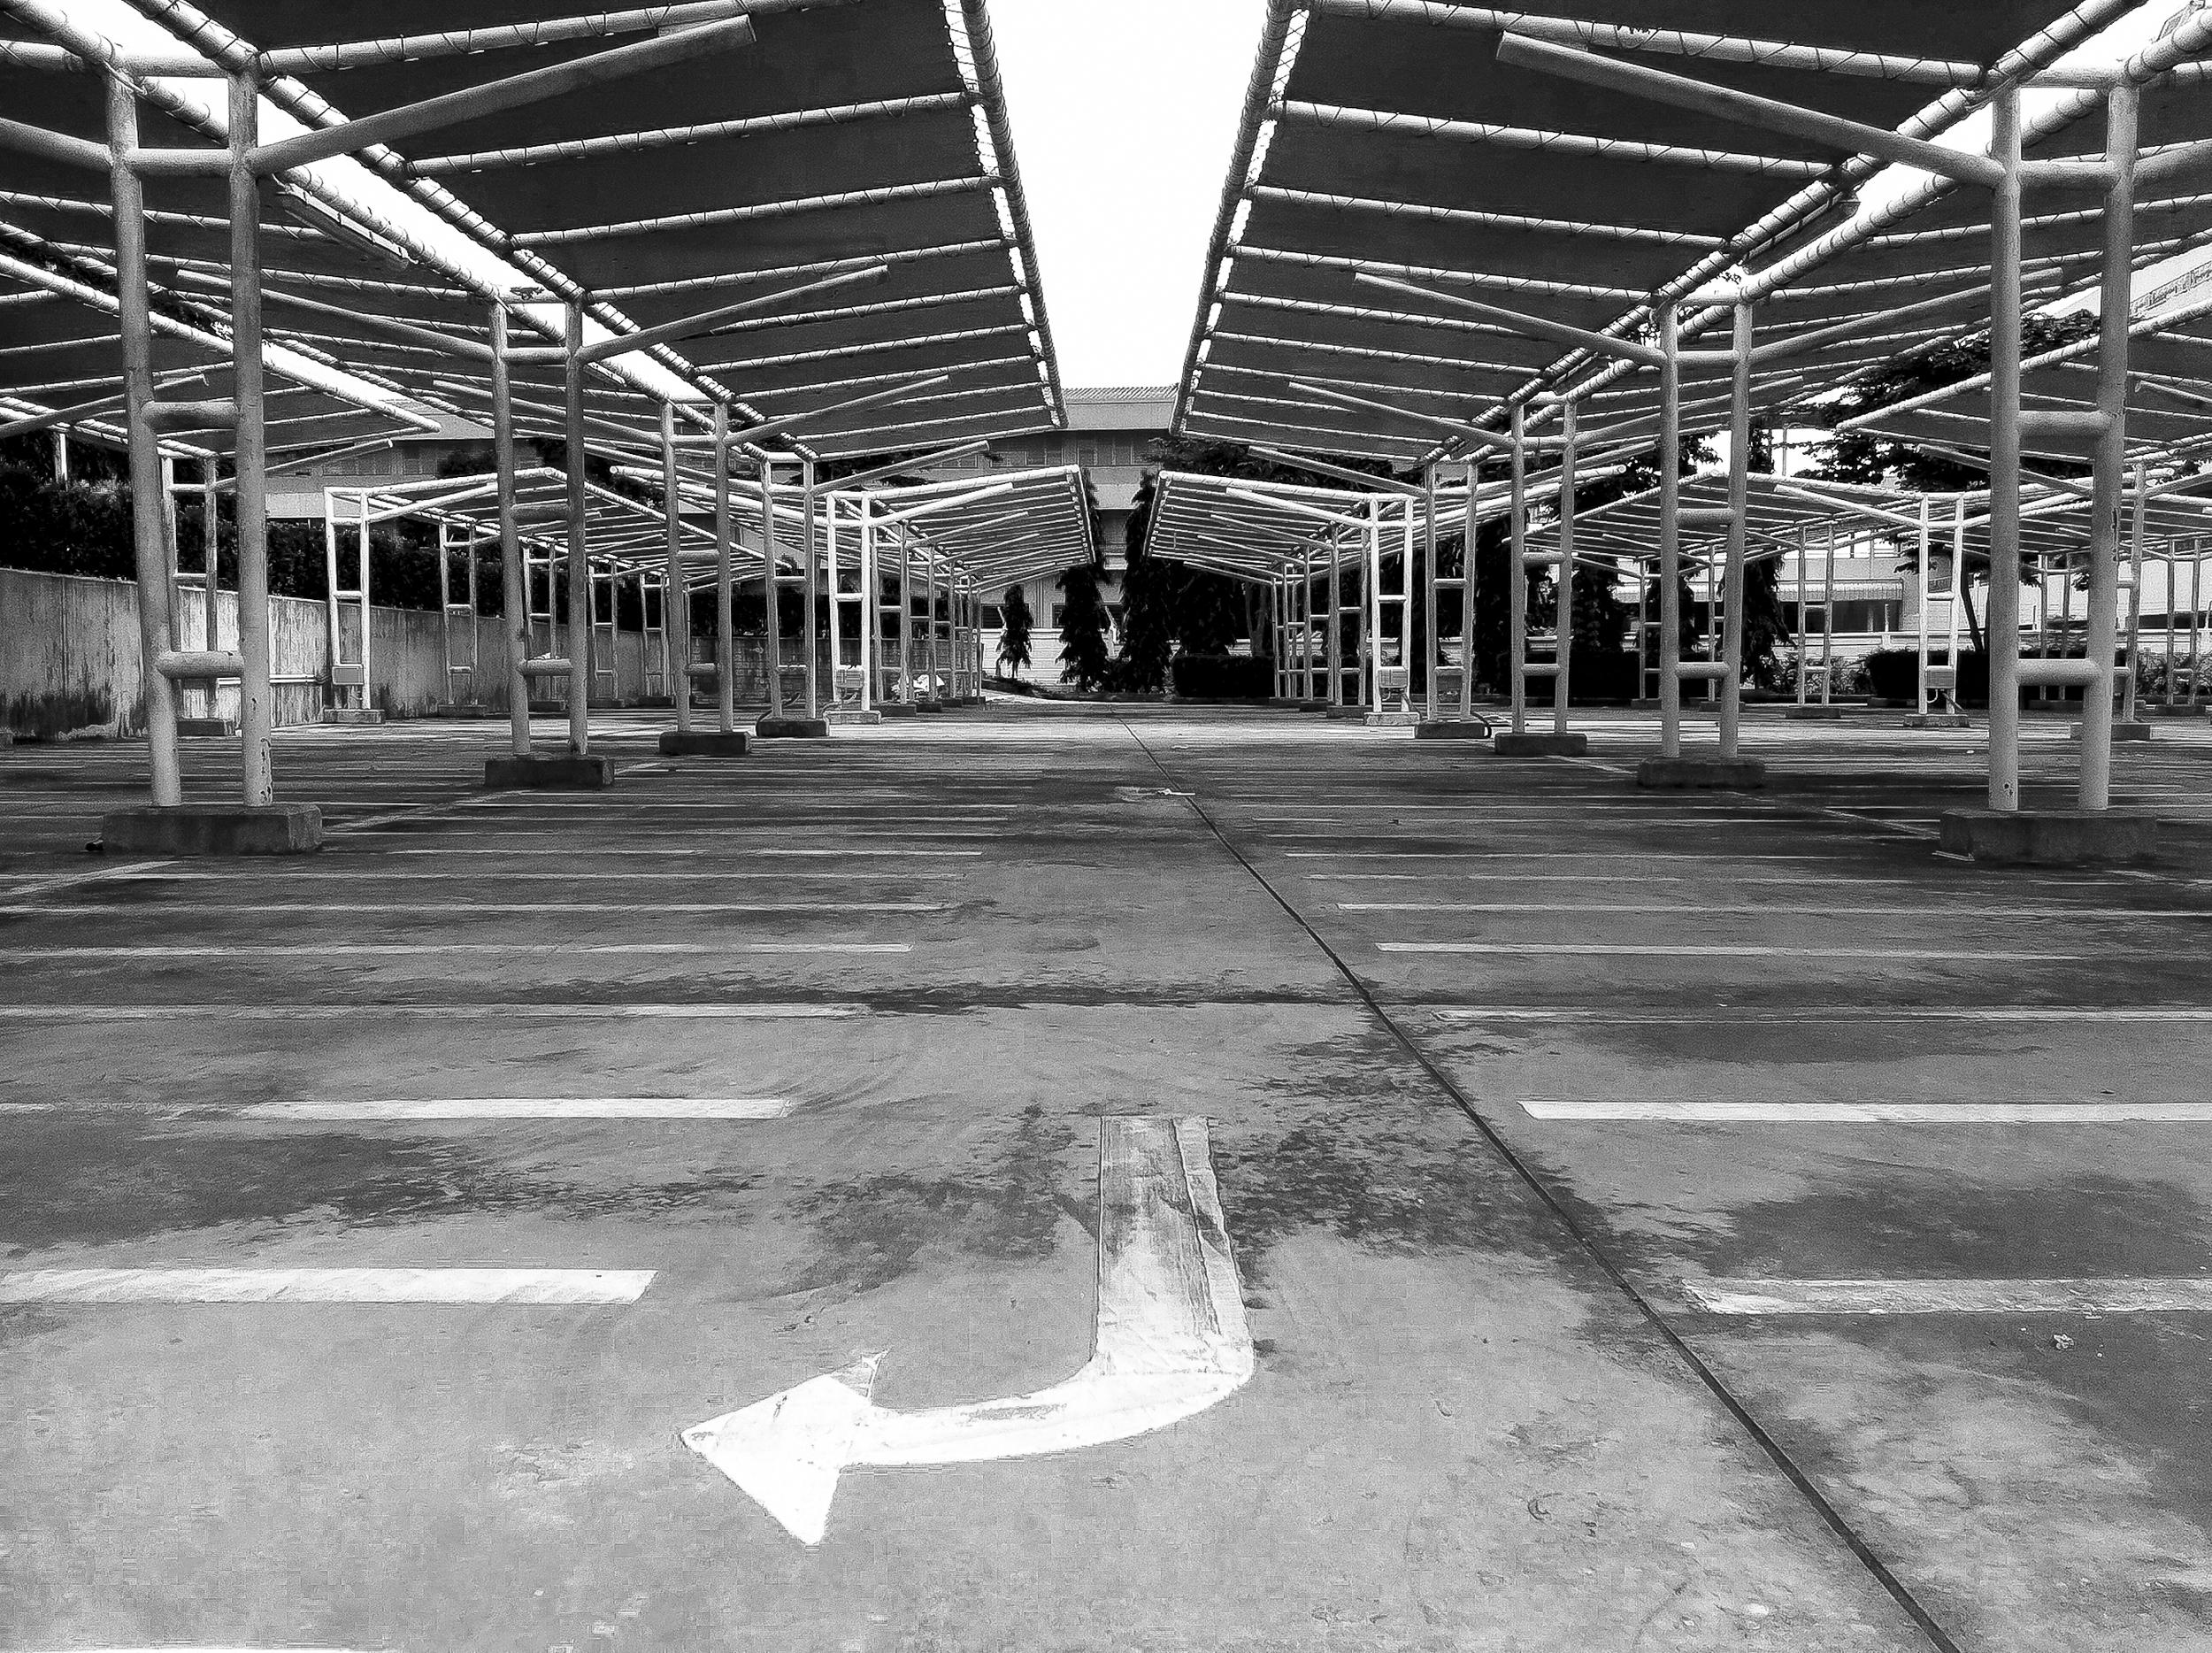 thai-parking-lot.jpg